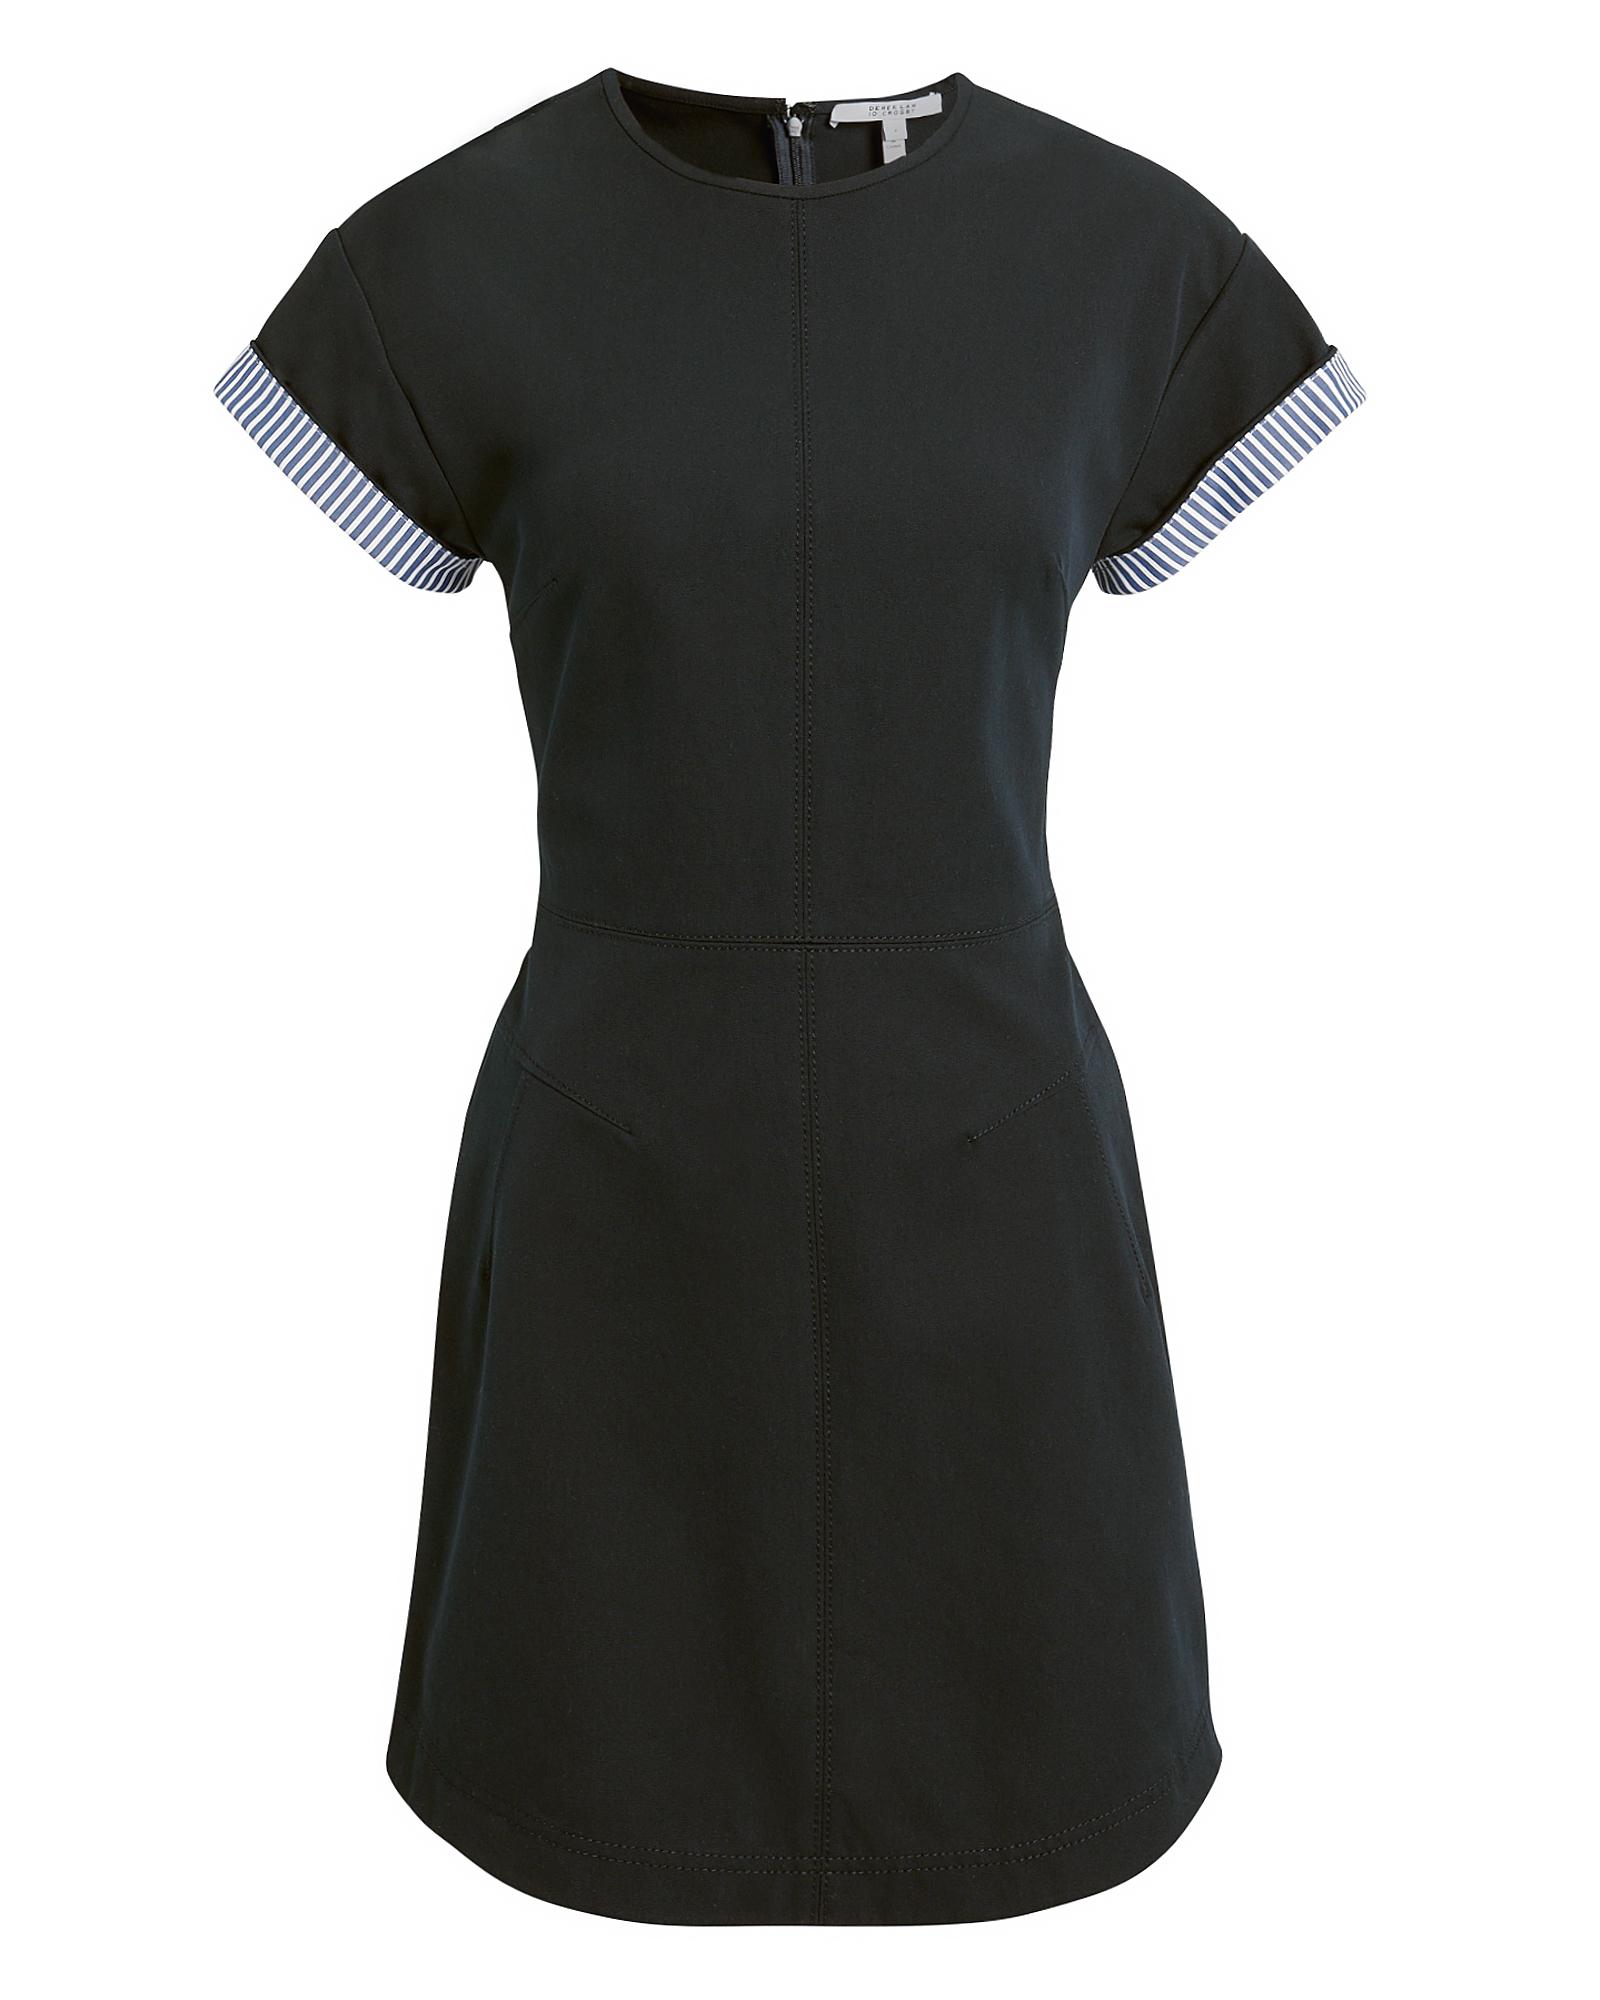 10 CROSBY Striped Sleeve Mini Dress